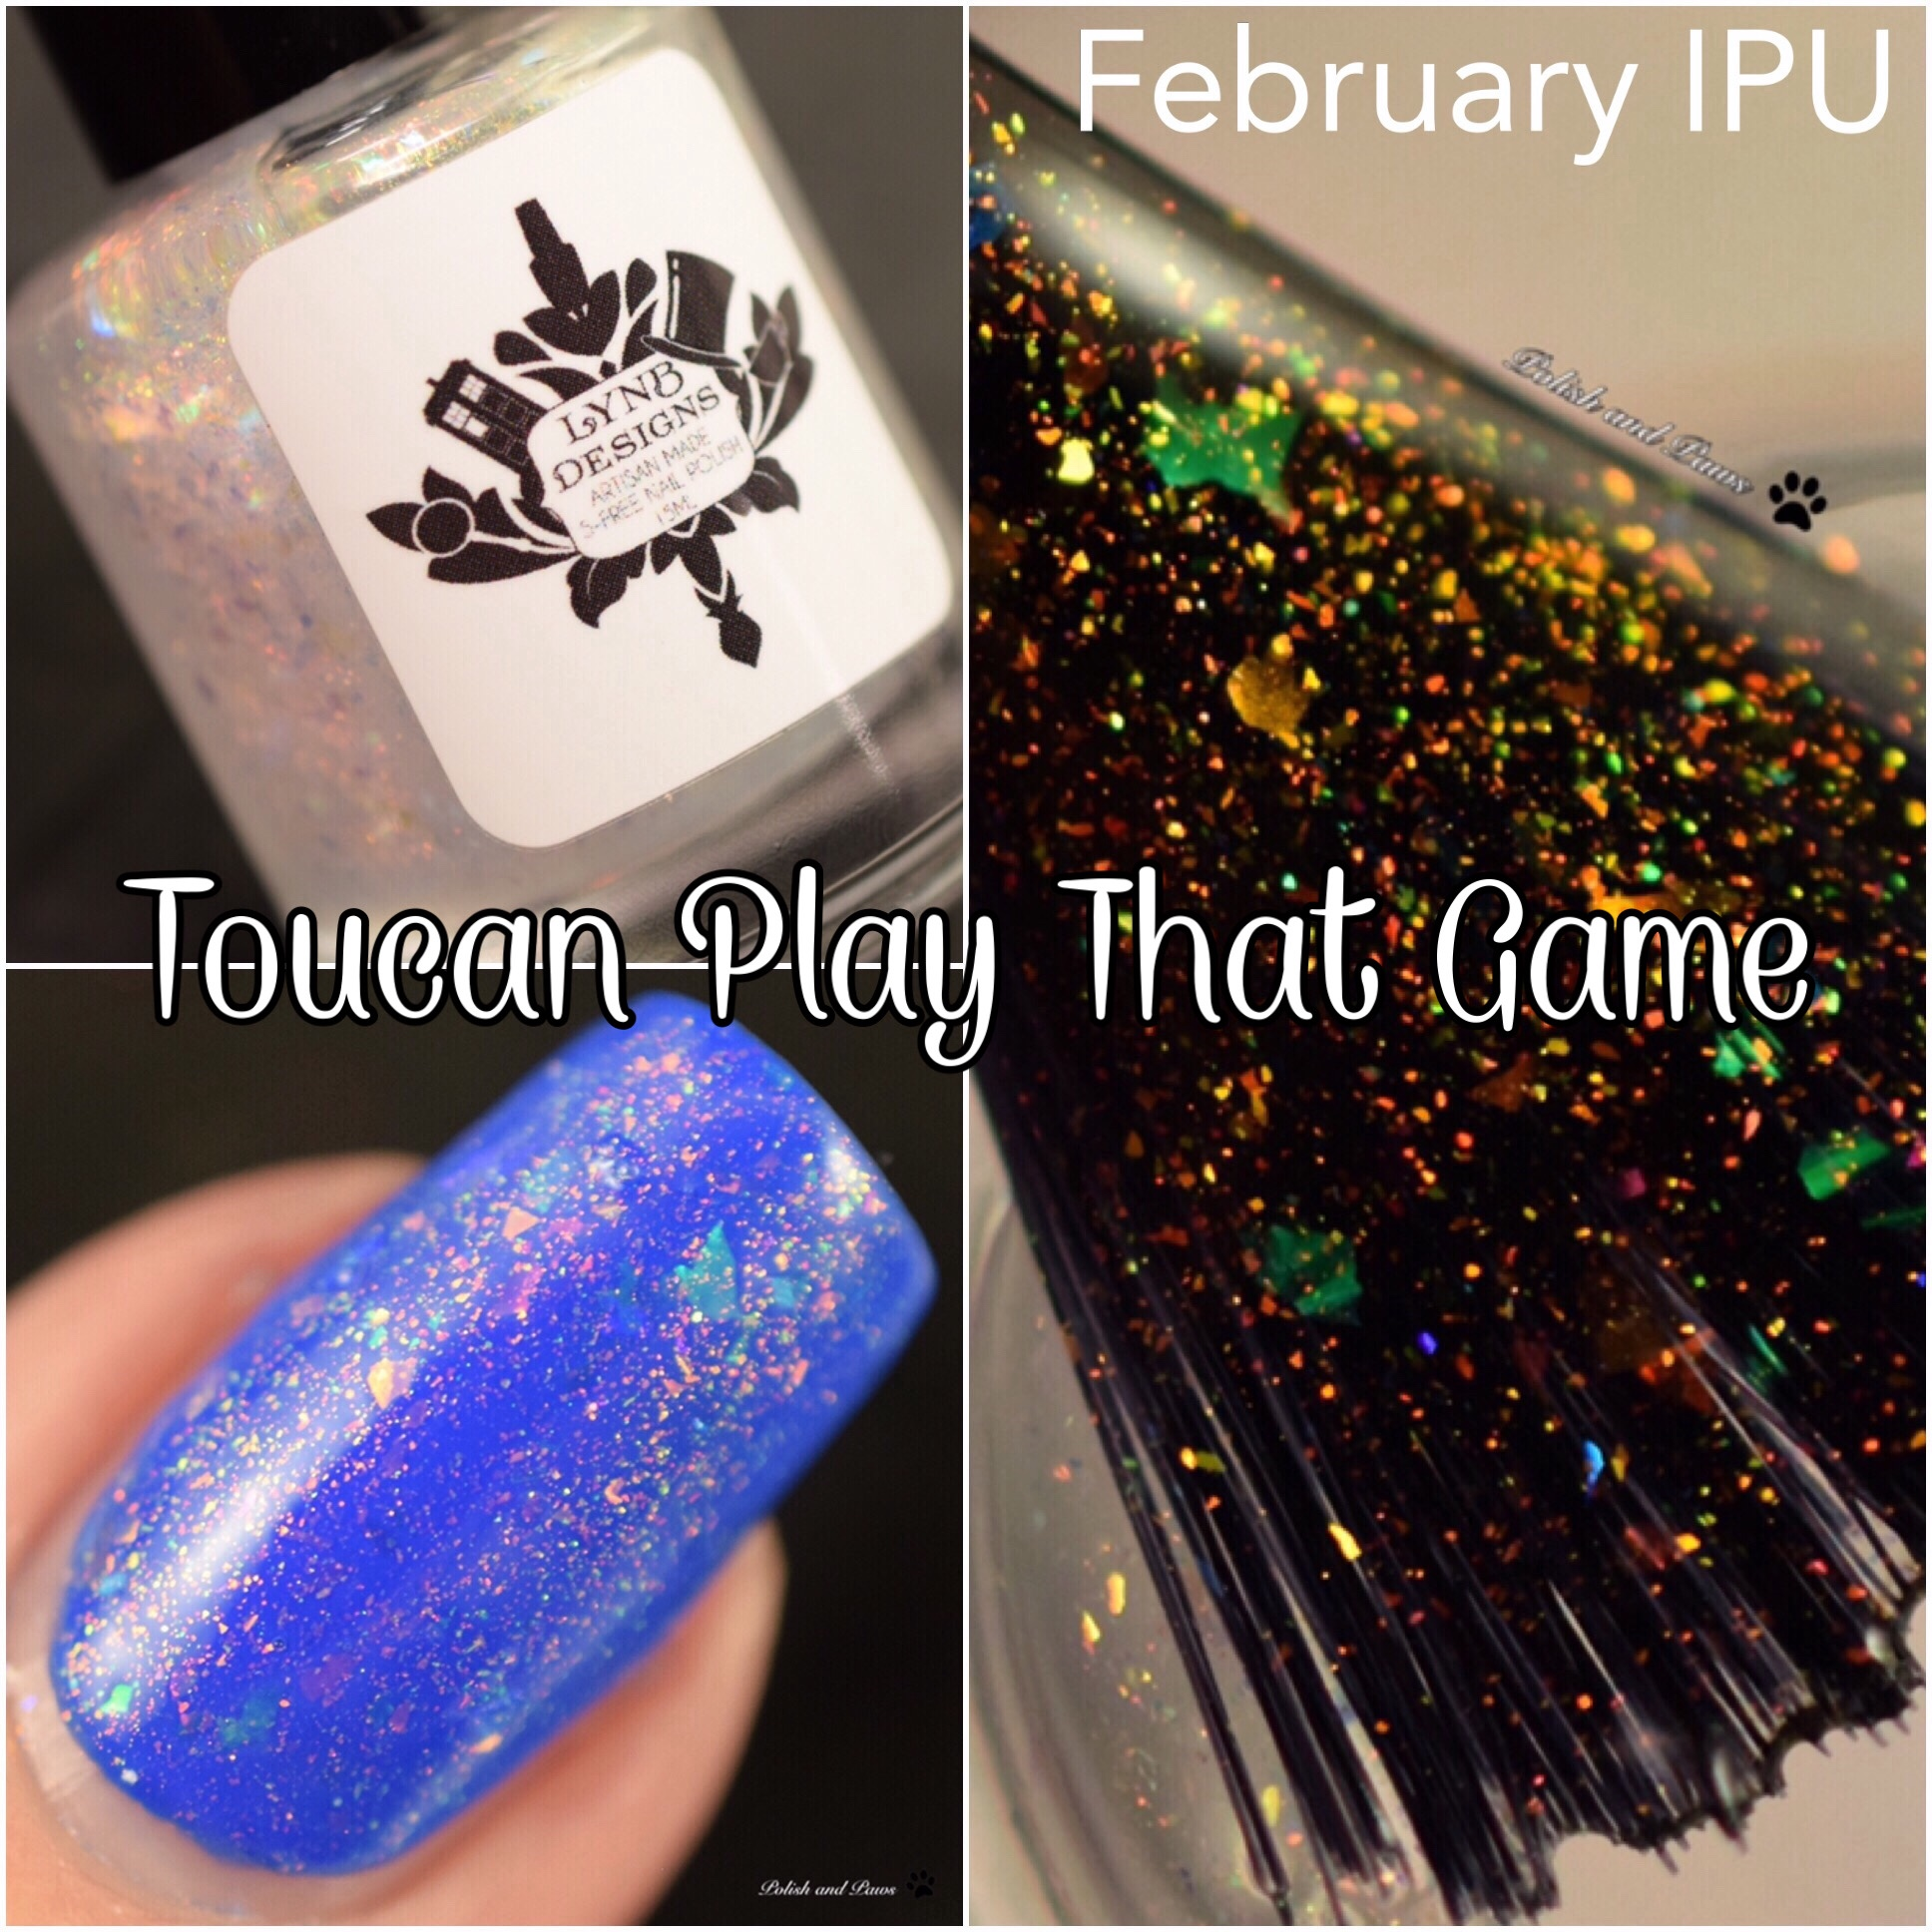 LynB Designs Toucan Play that Game